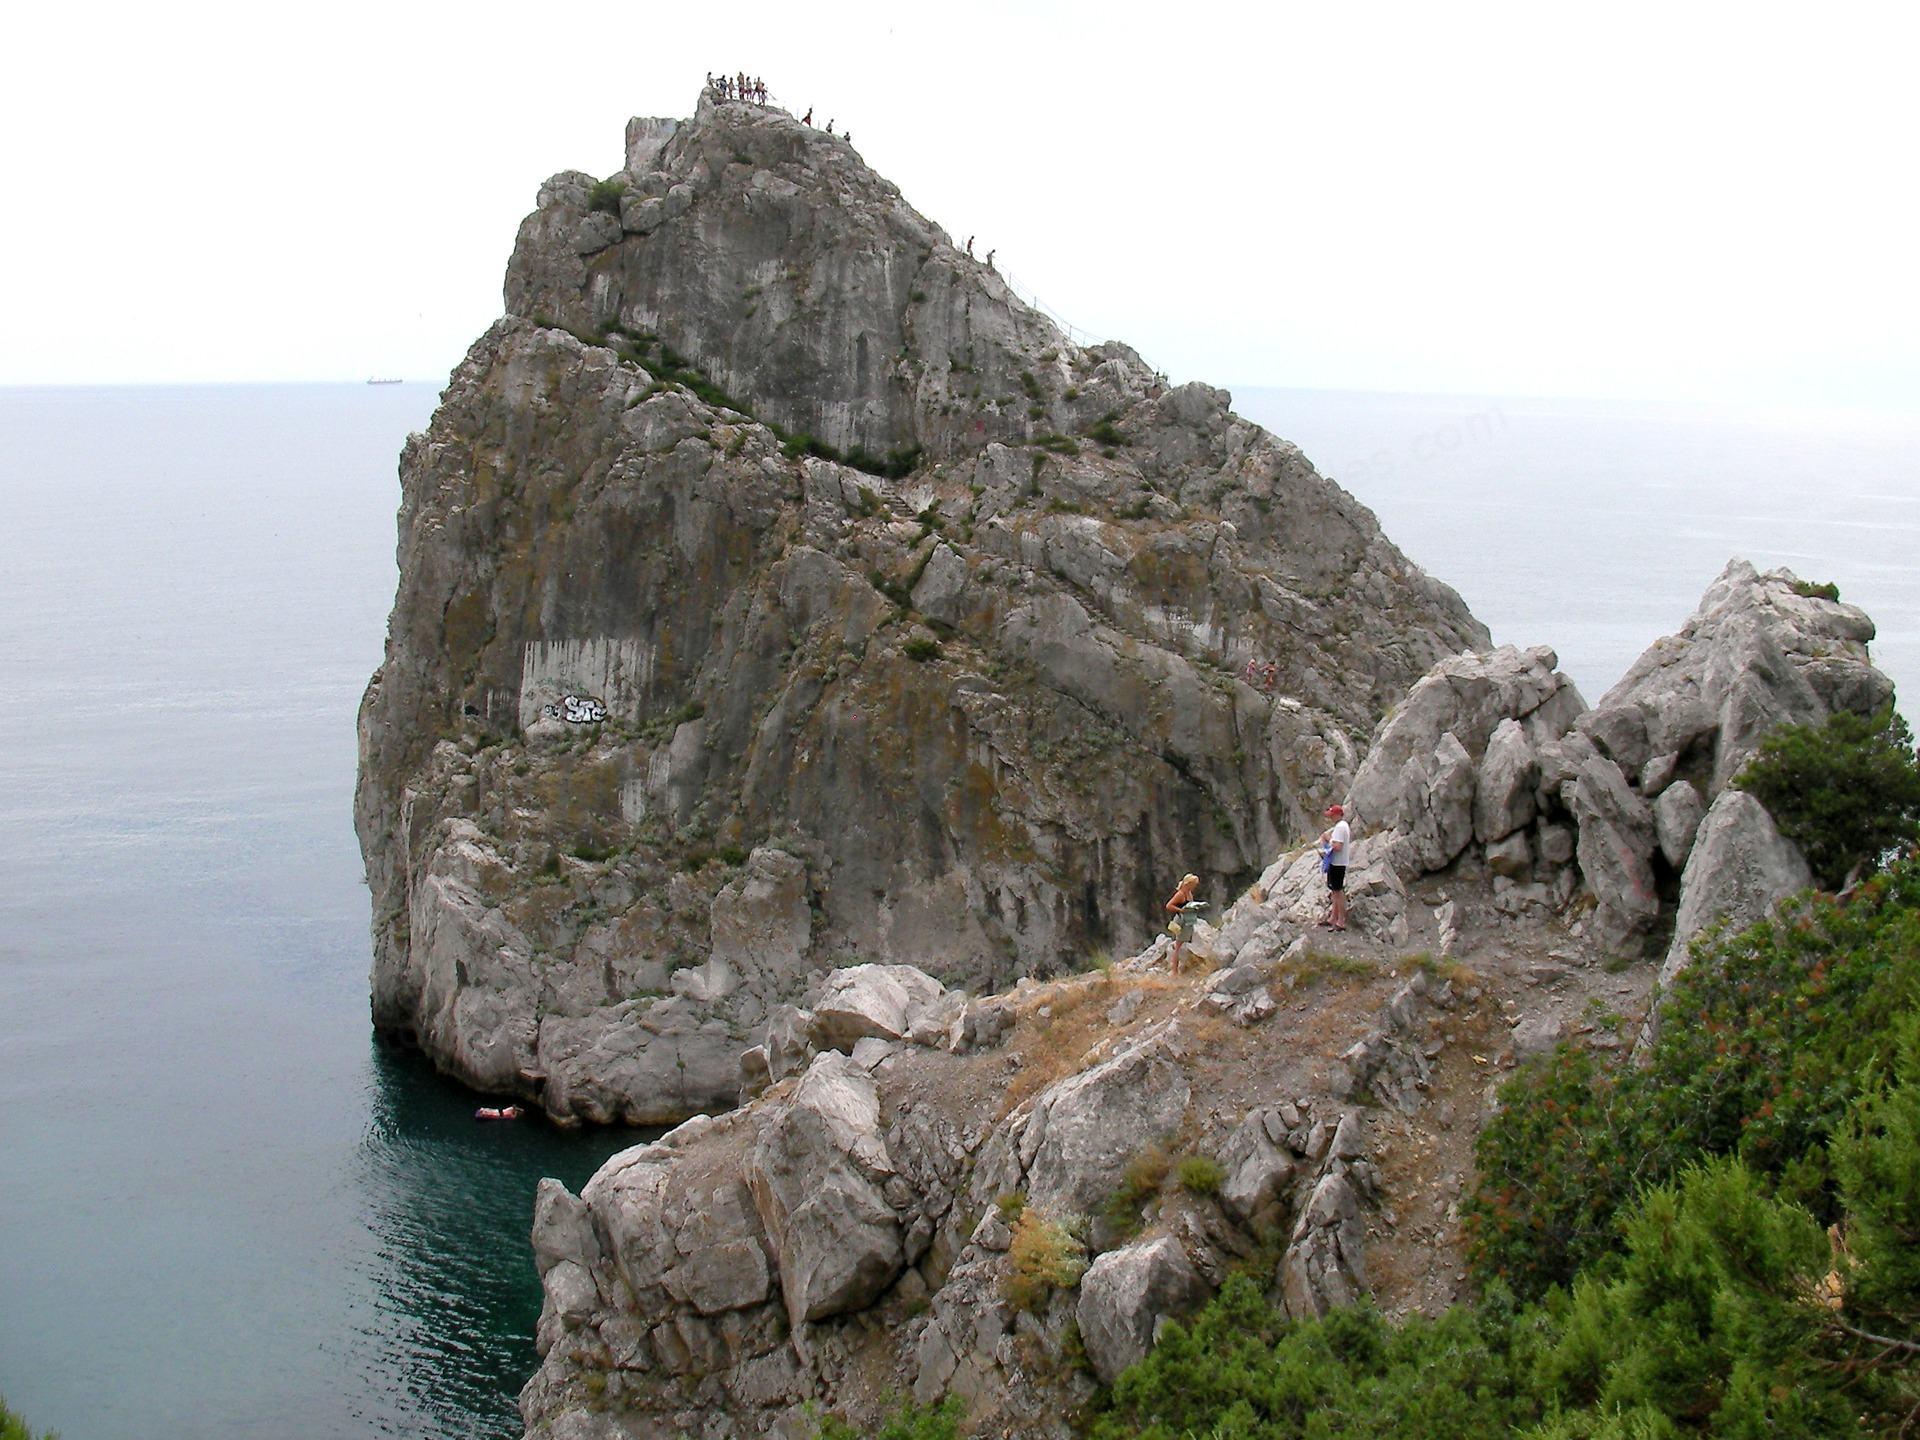 Tourists climb on the rock Diva in Simeiz in Crimea